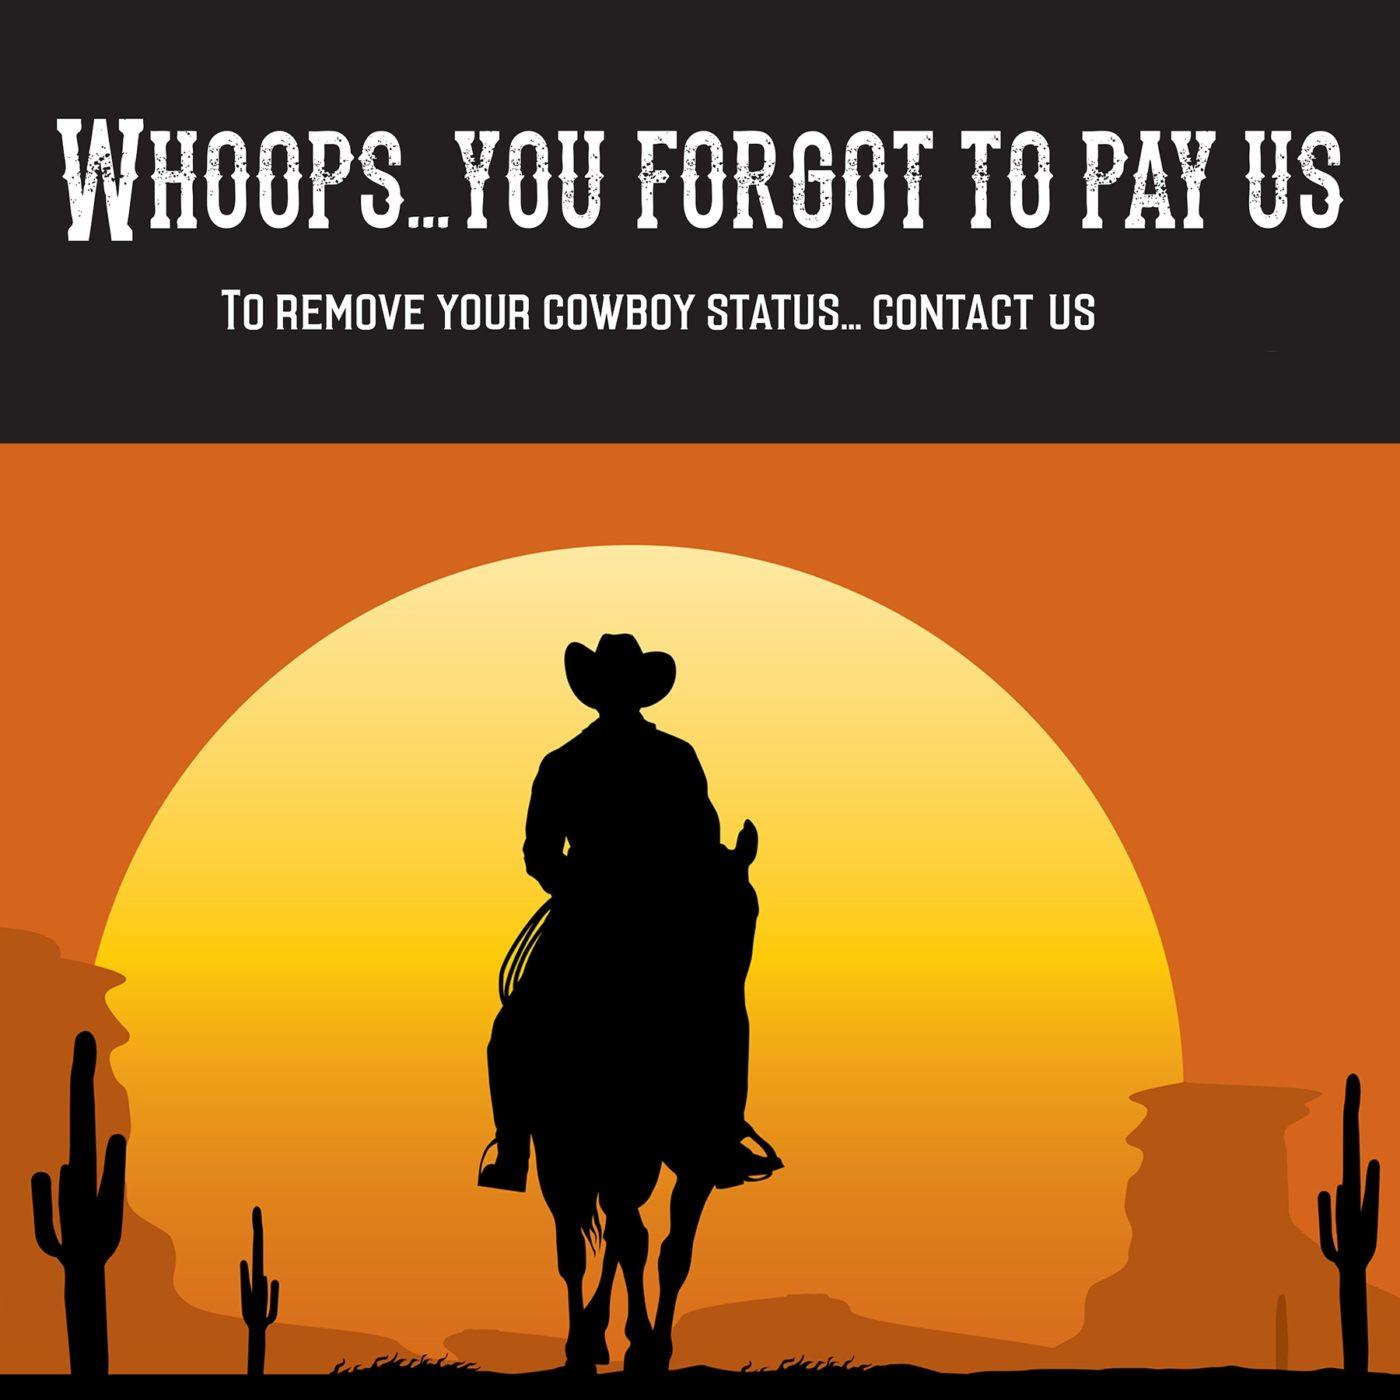 cowboy status